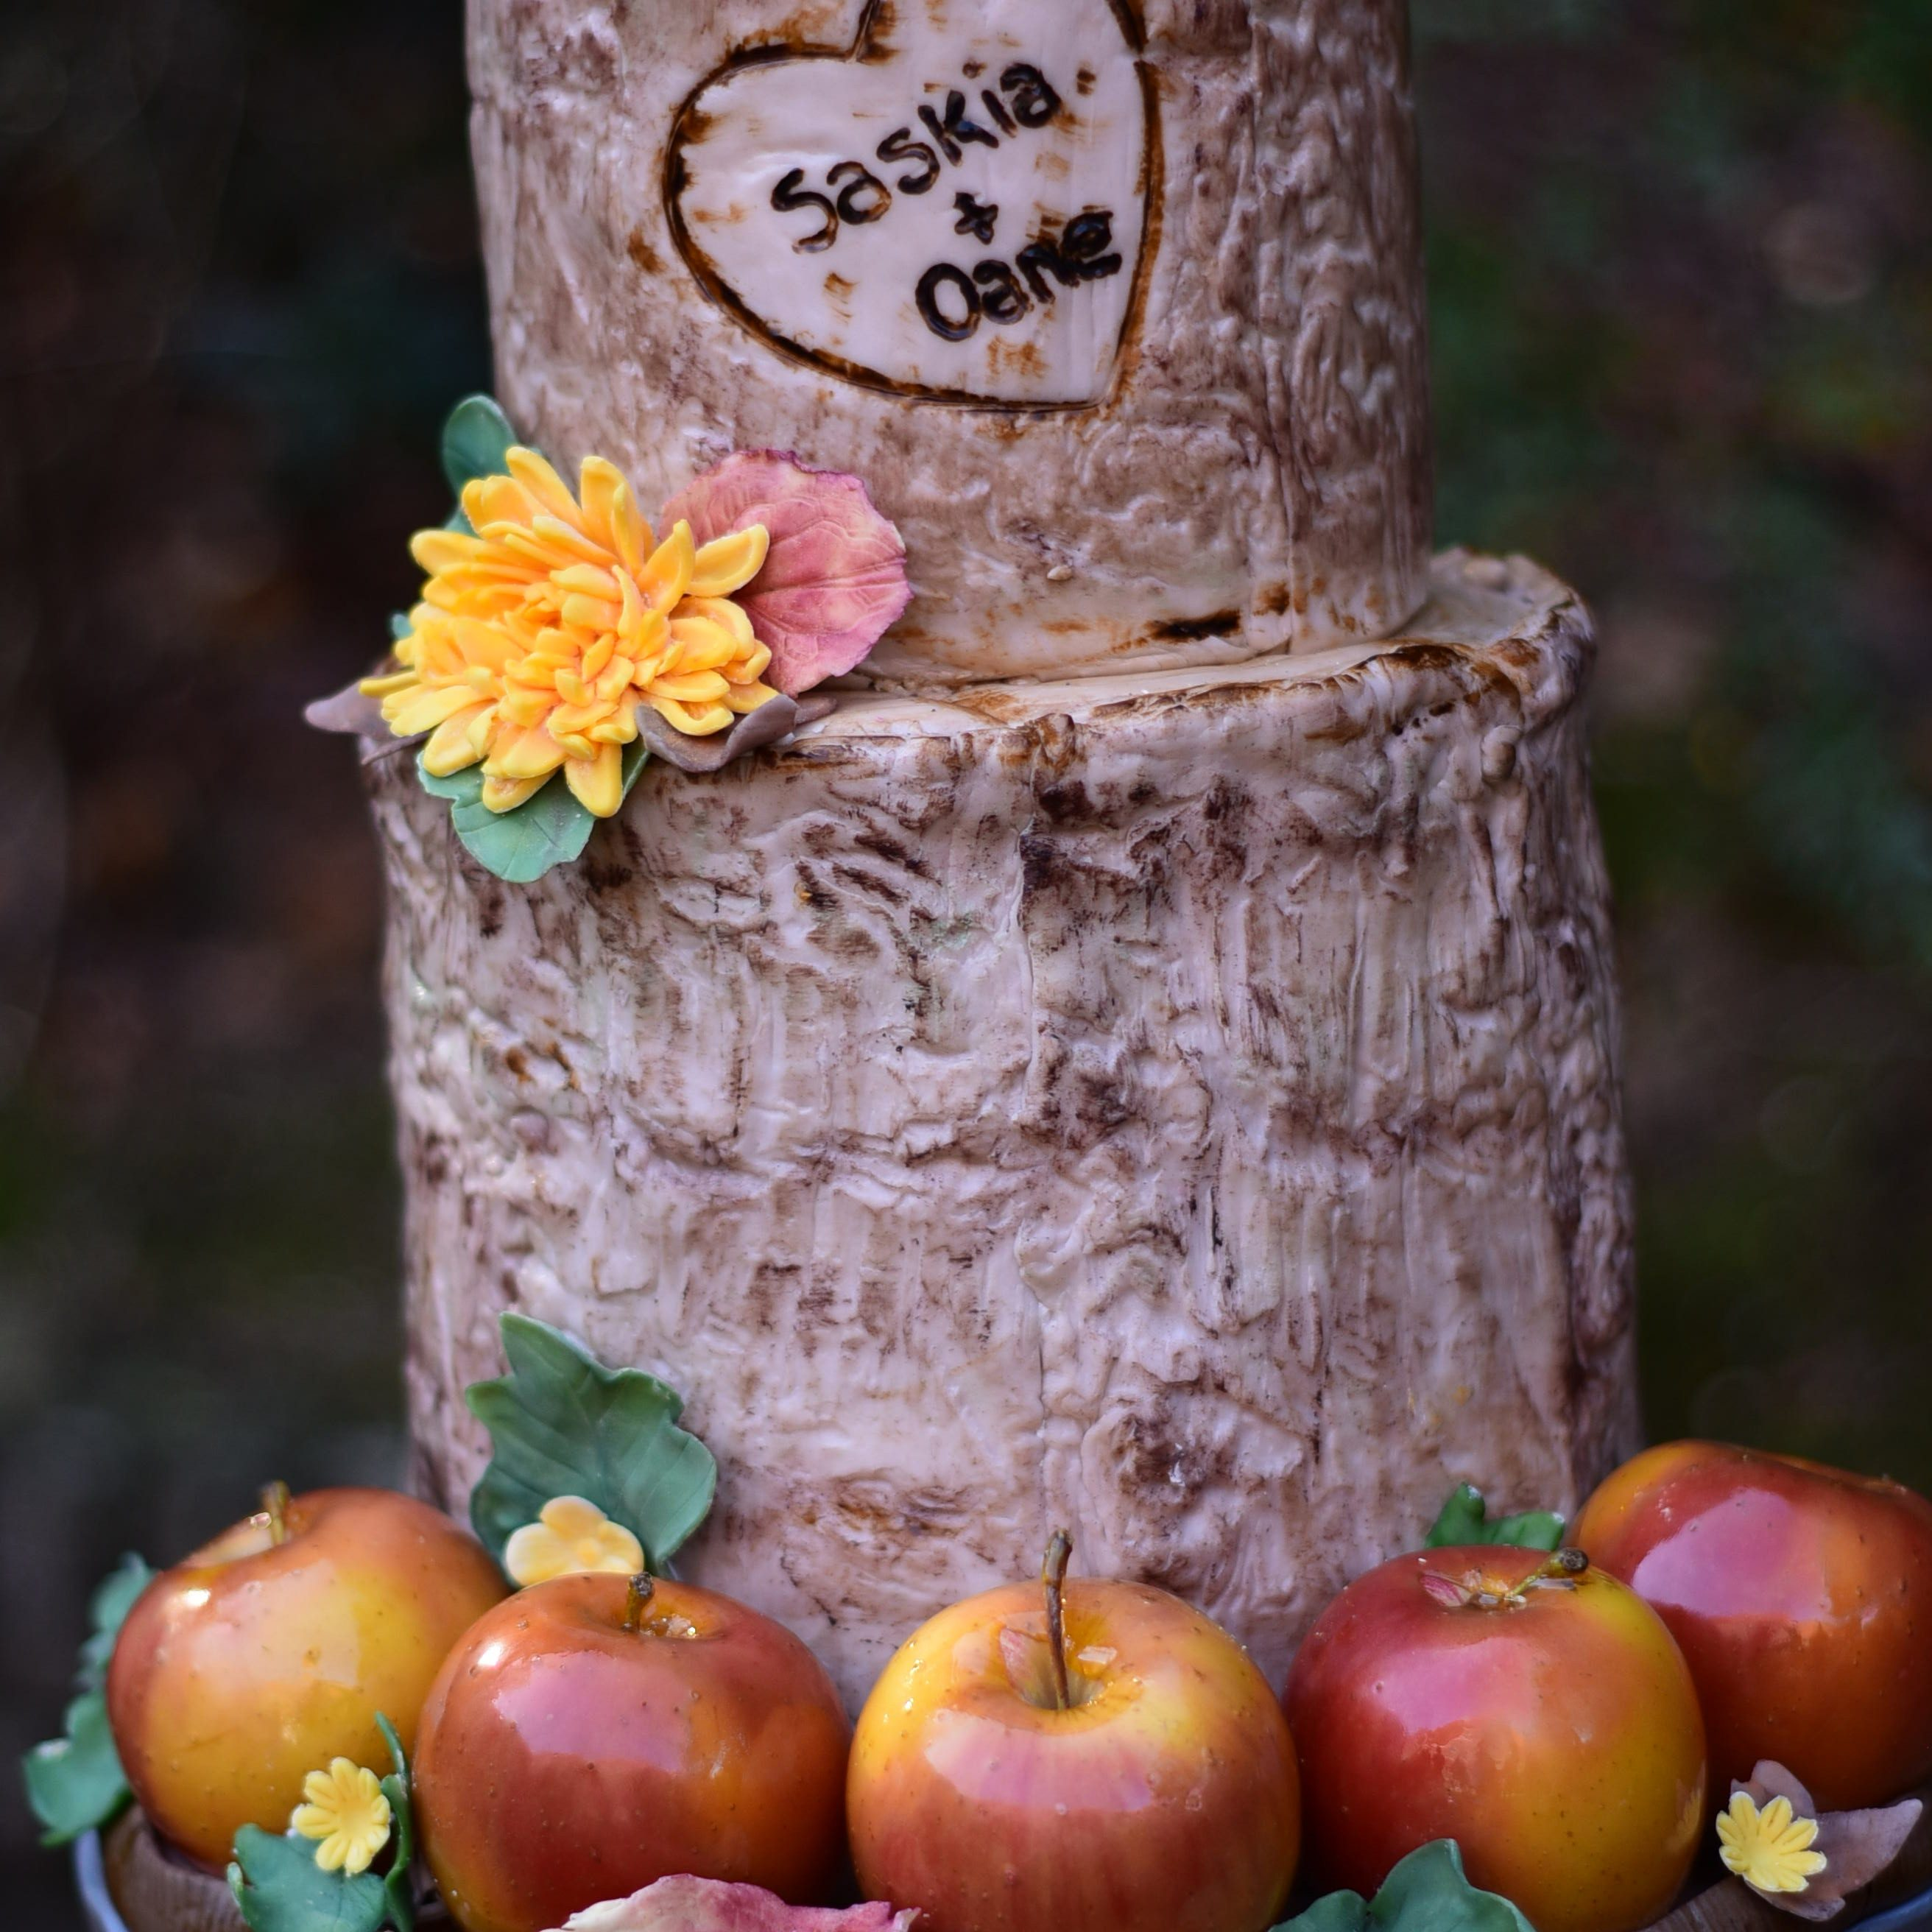 Iris Vreeman (fotografiecursus) - autumn wedding cake (4)